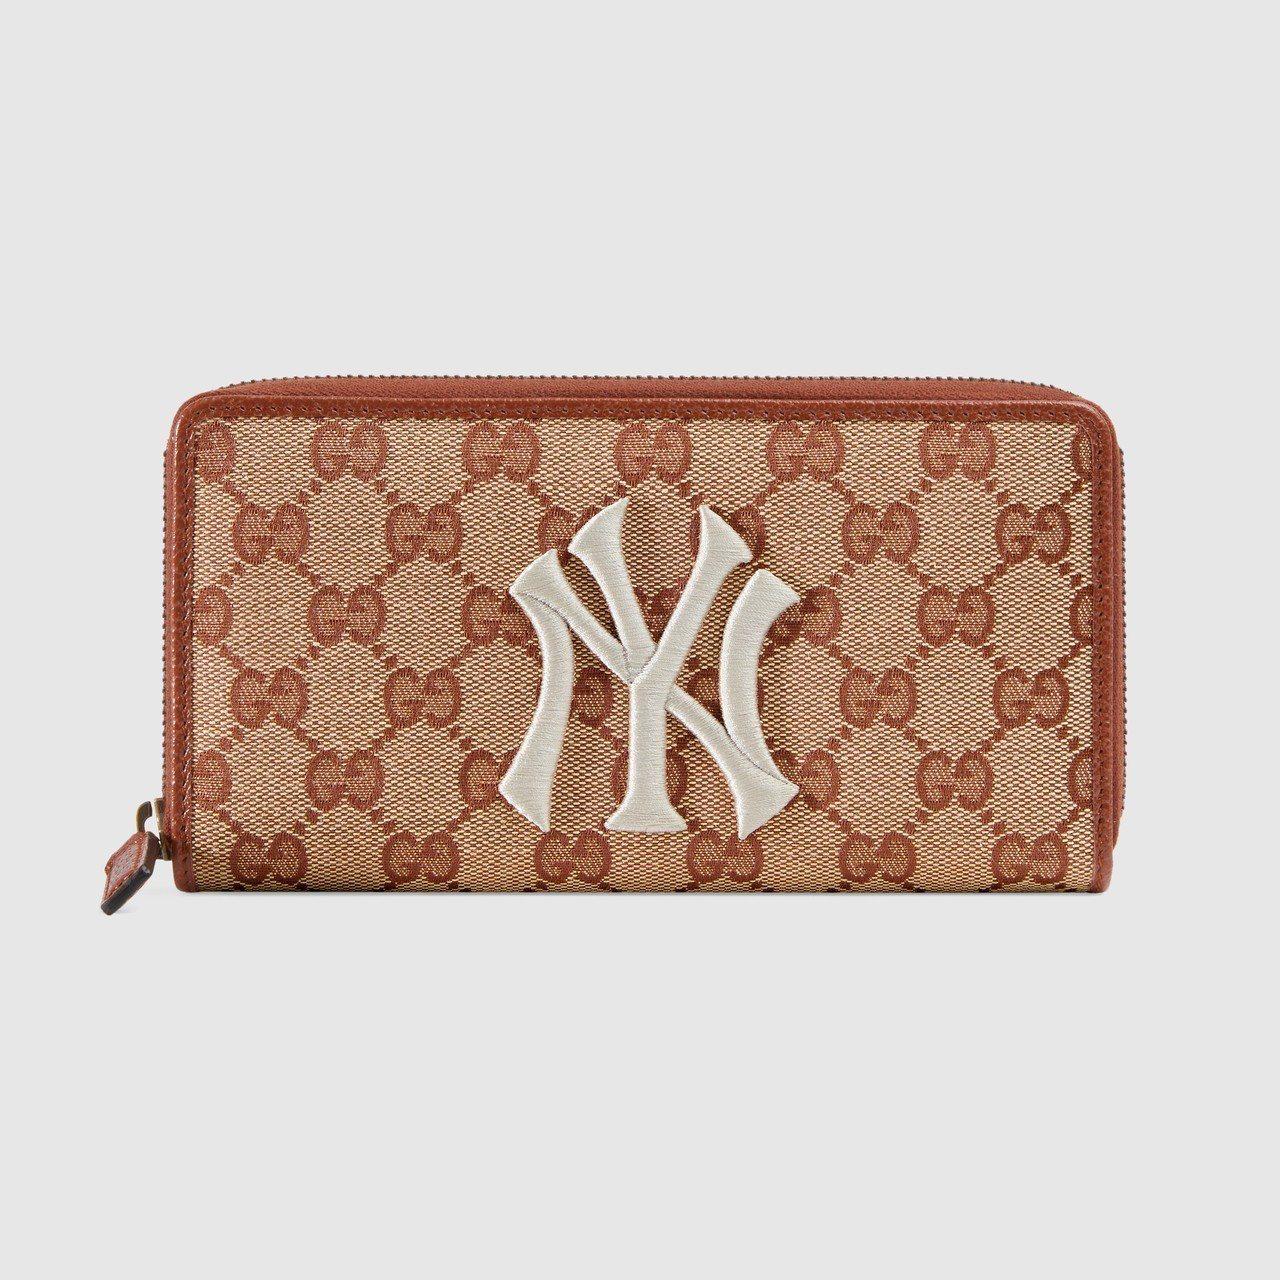 NY Yankees™紐約洋基隊貼飾長夾,24,700元。圖/Gucci提供